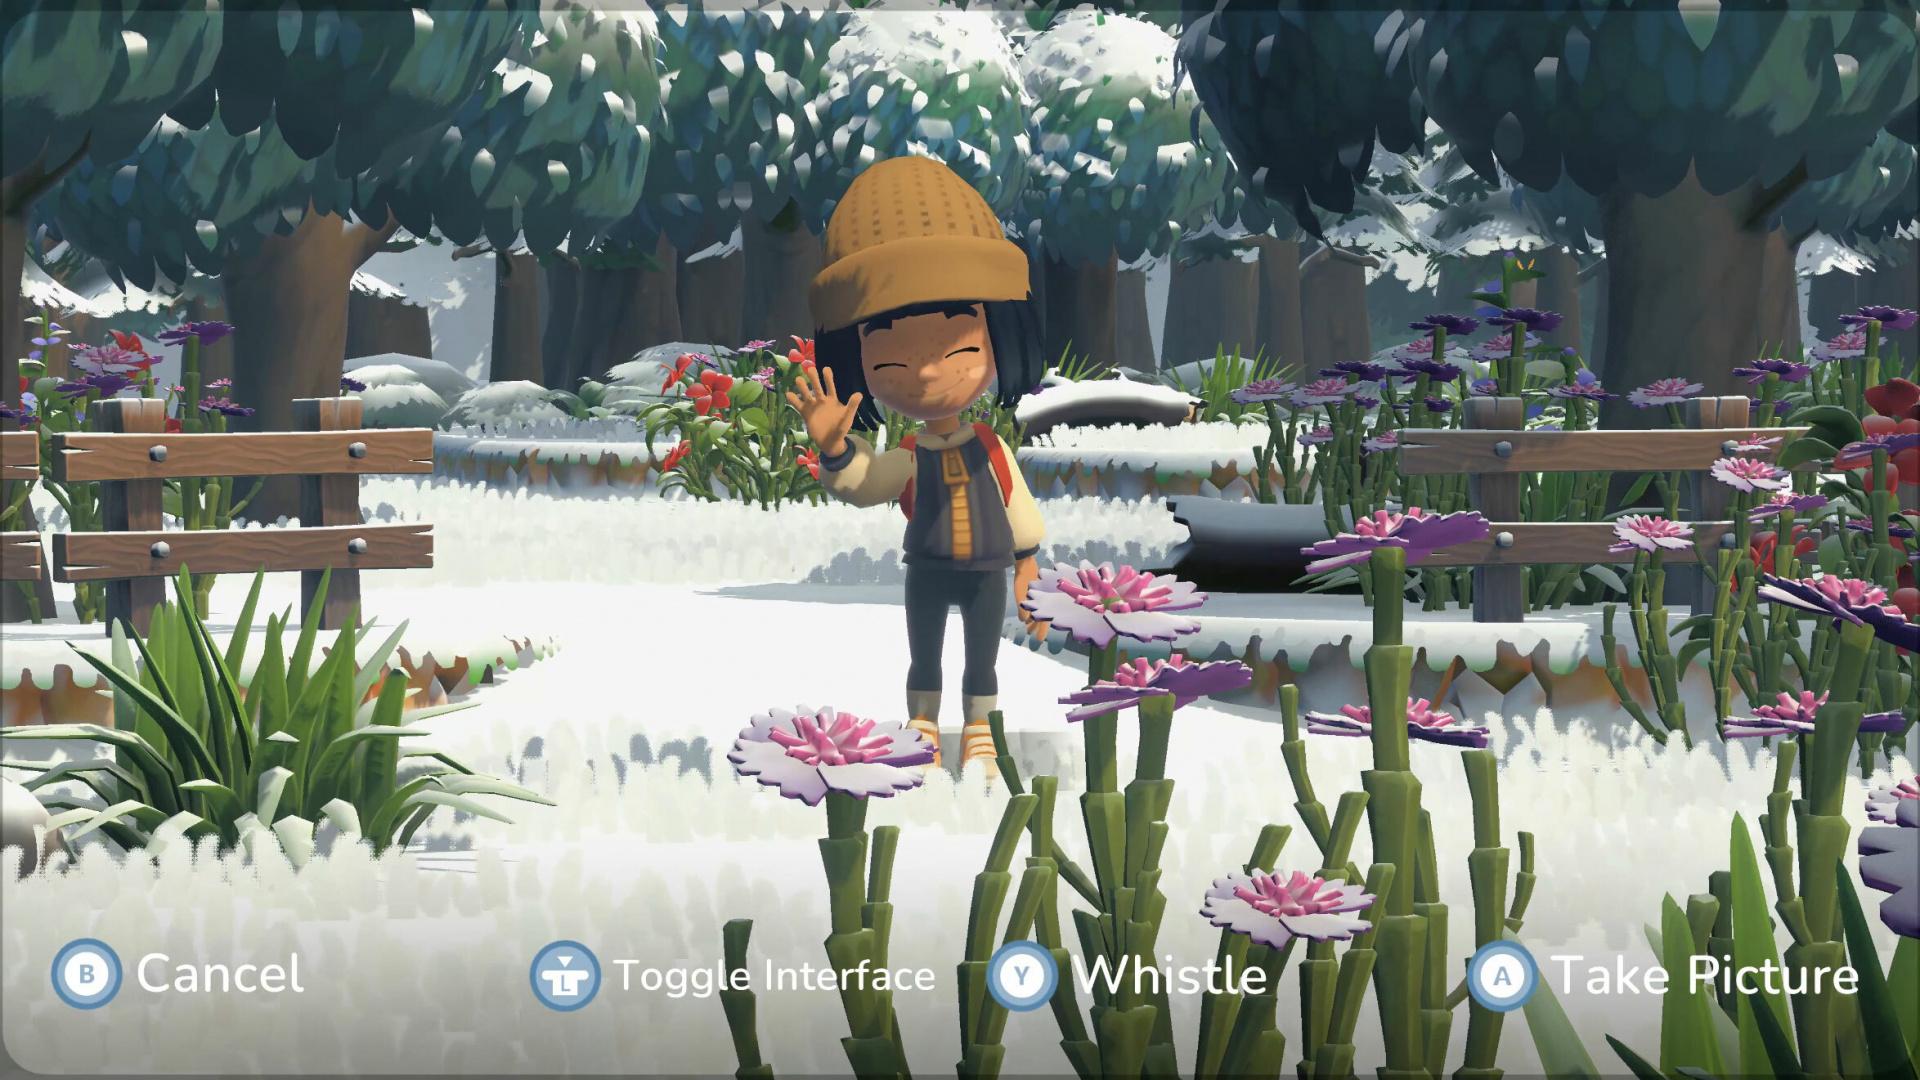 В Hokko Life добавили шапки, маски и фоторежим